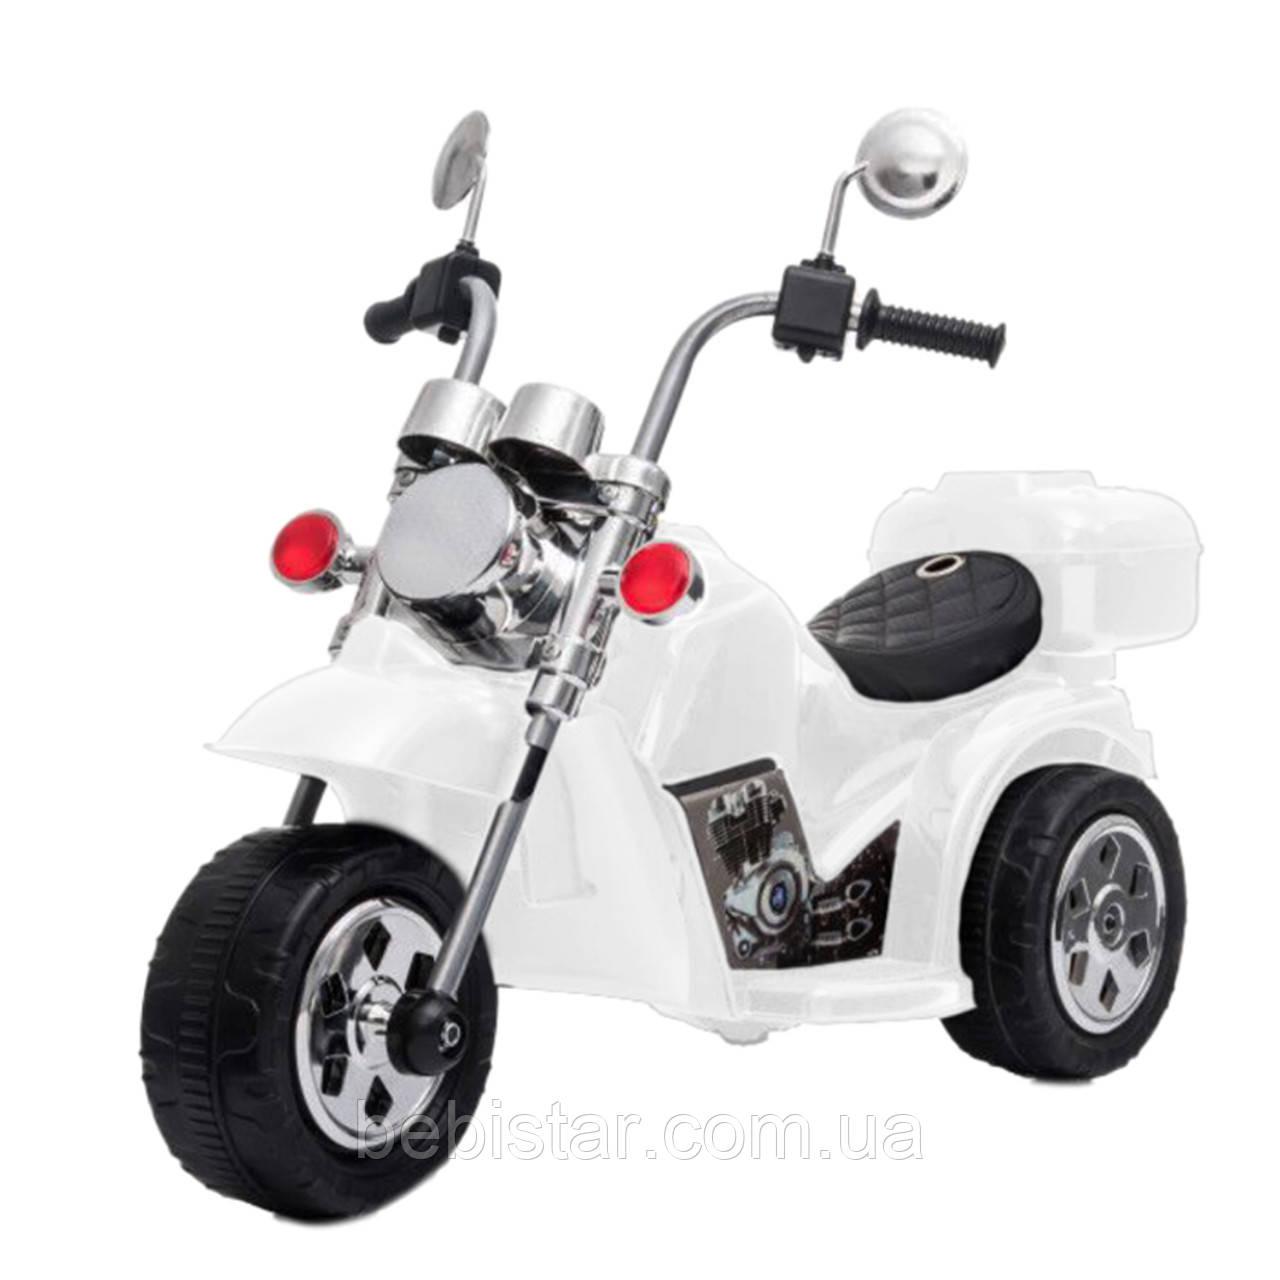 Детский электромобиль-трицикл белый Т-7230 WHITE деткам от 2 до 4 лет